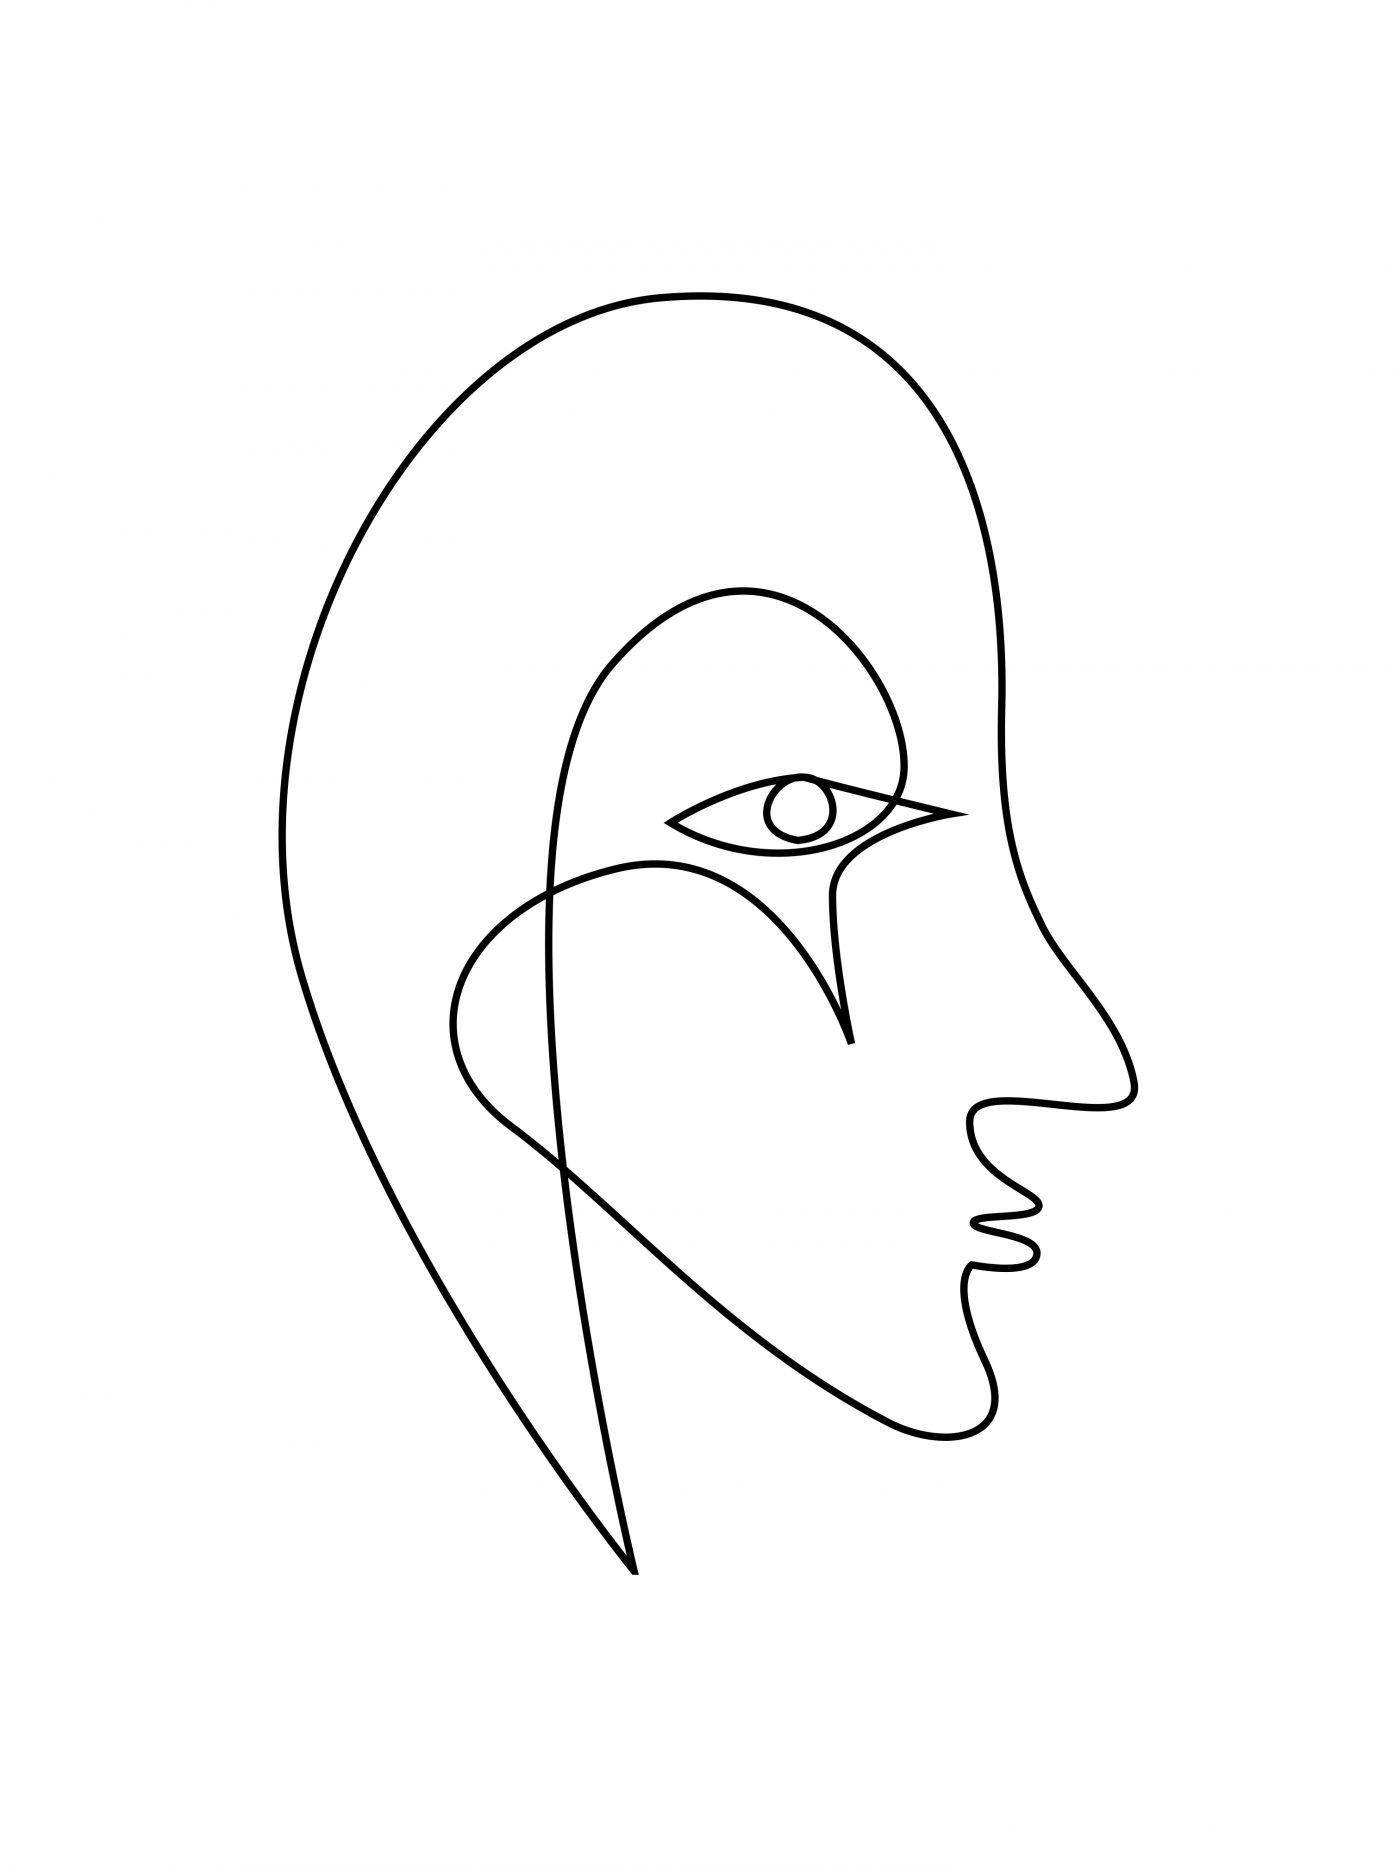 1st Face